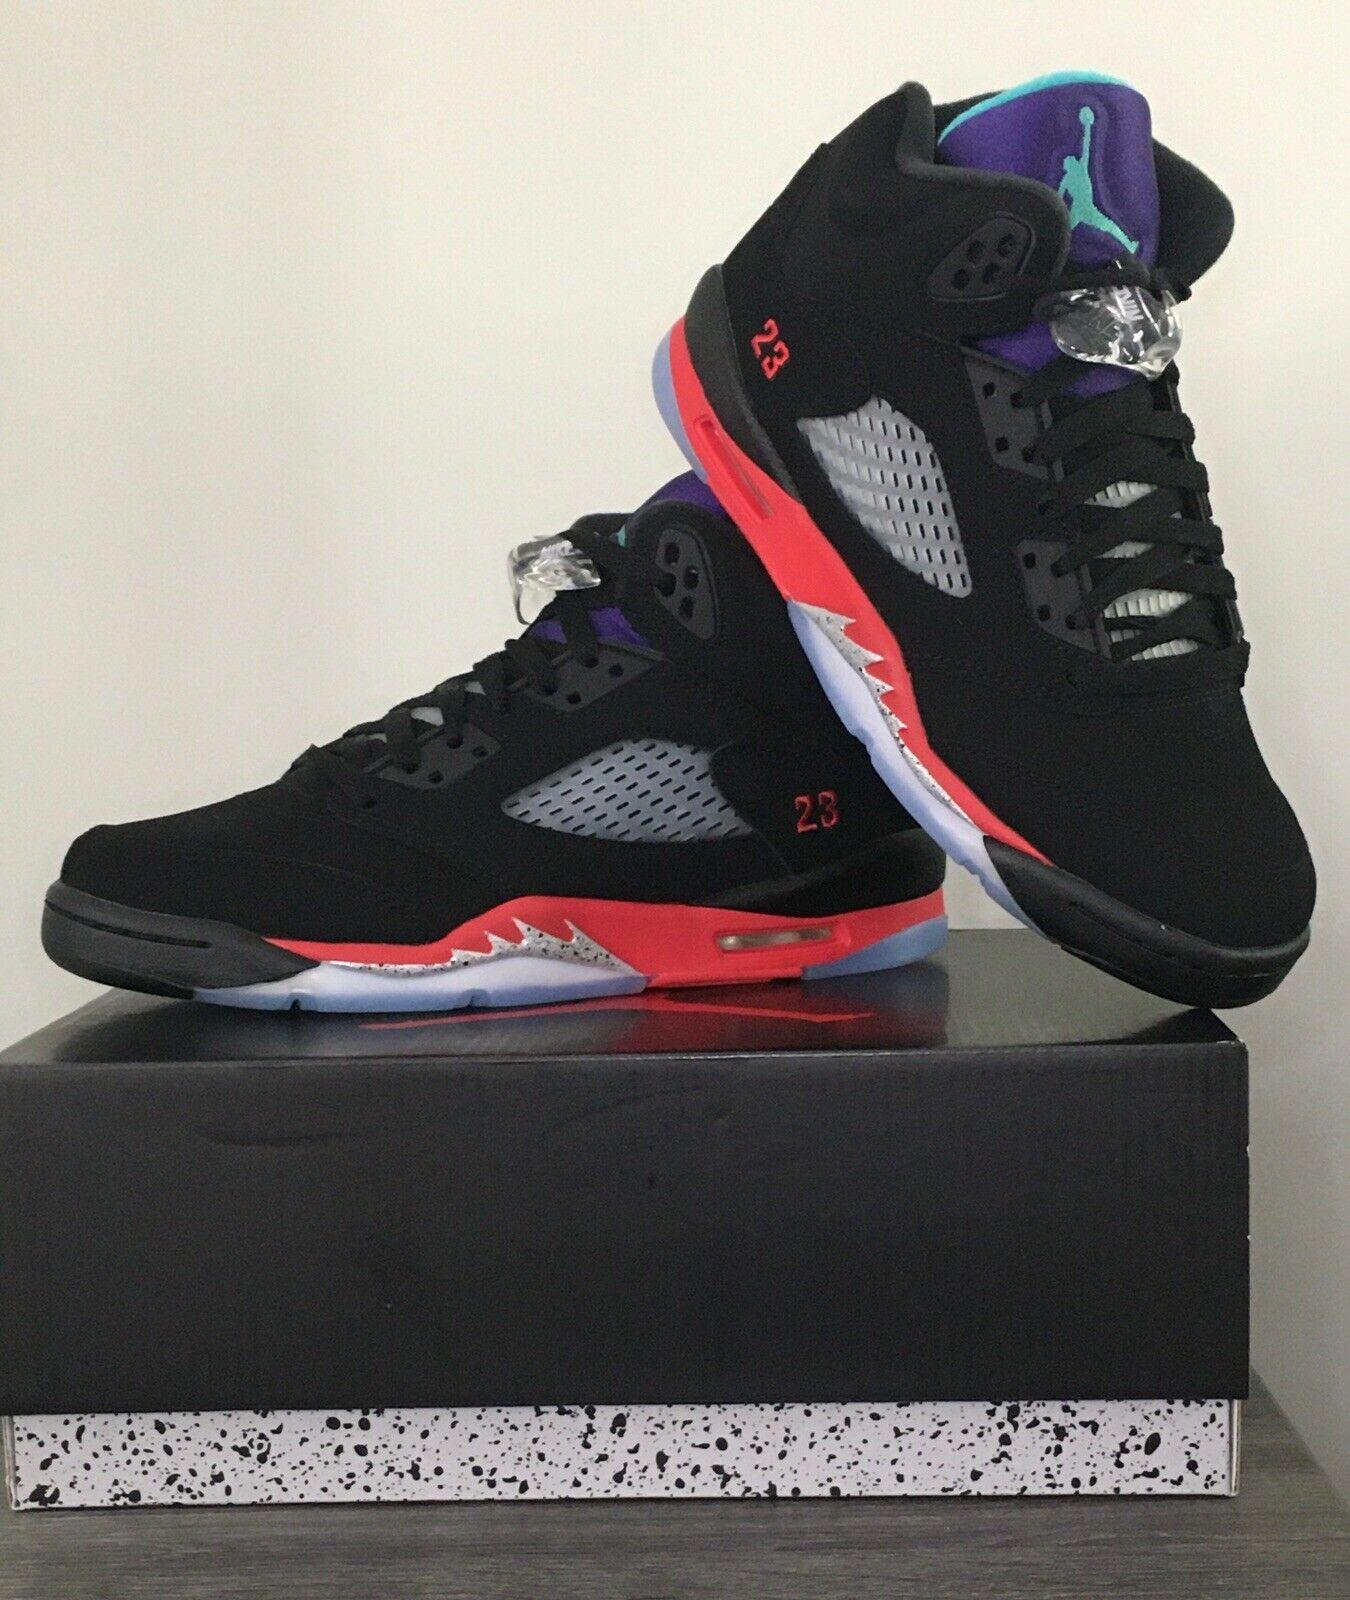 Jordan 5 Retro Top 3 GS